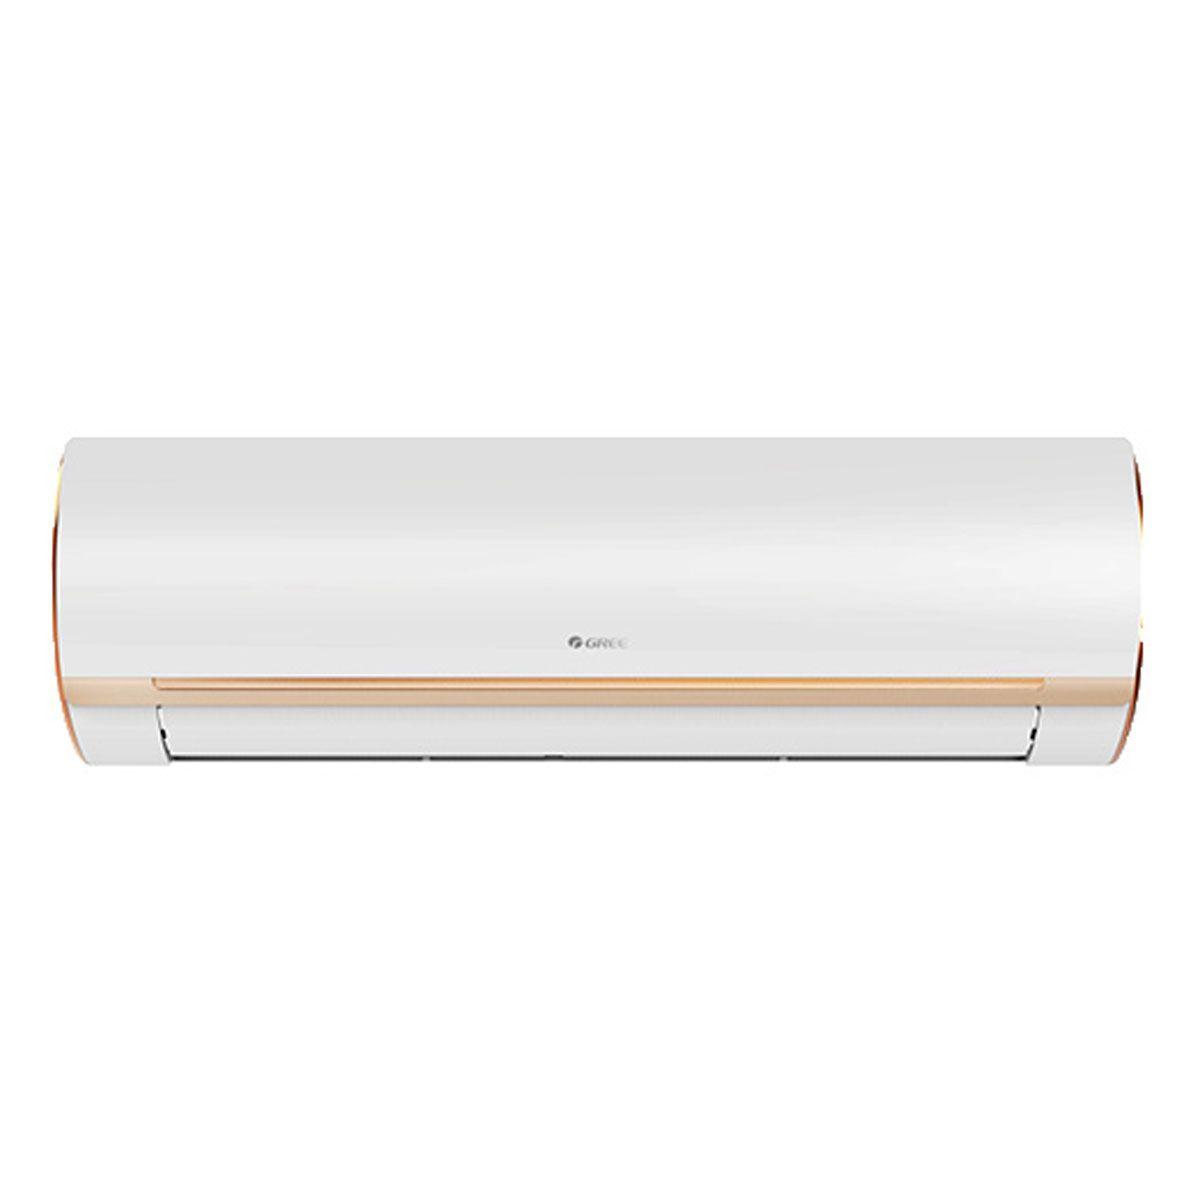 Gree 1.5 Ton Fairy Series Inverter Split AC (GS18FITH5WB)